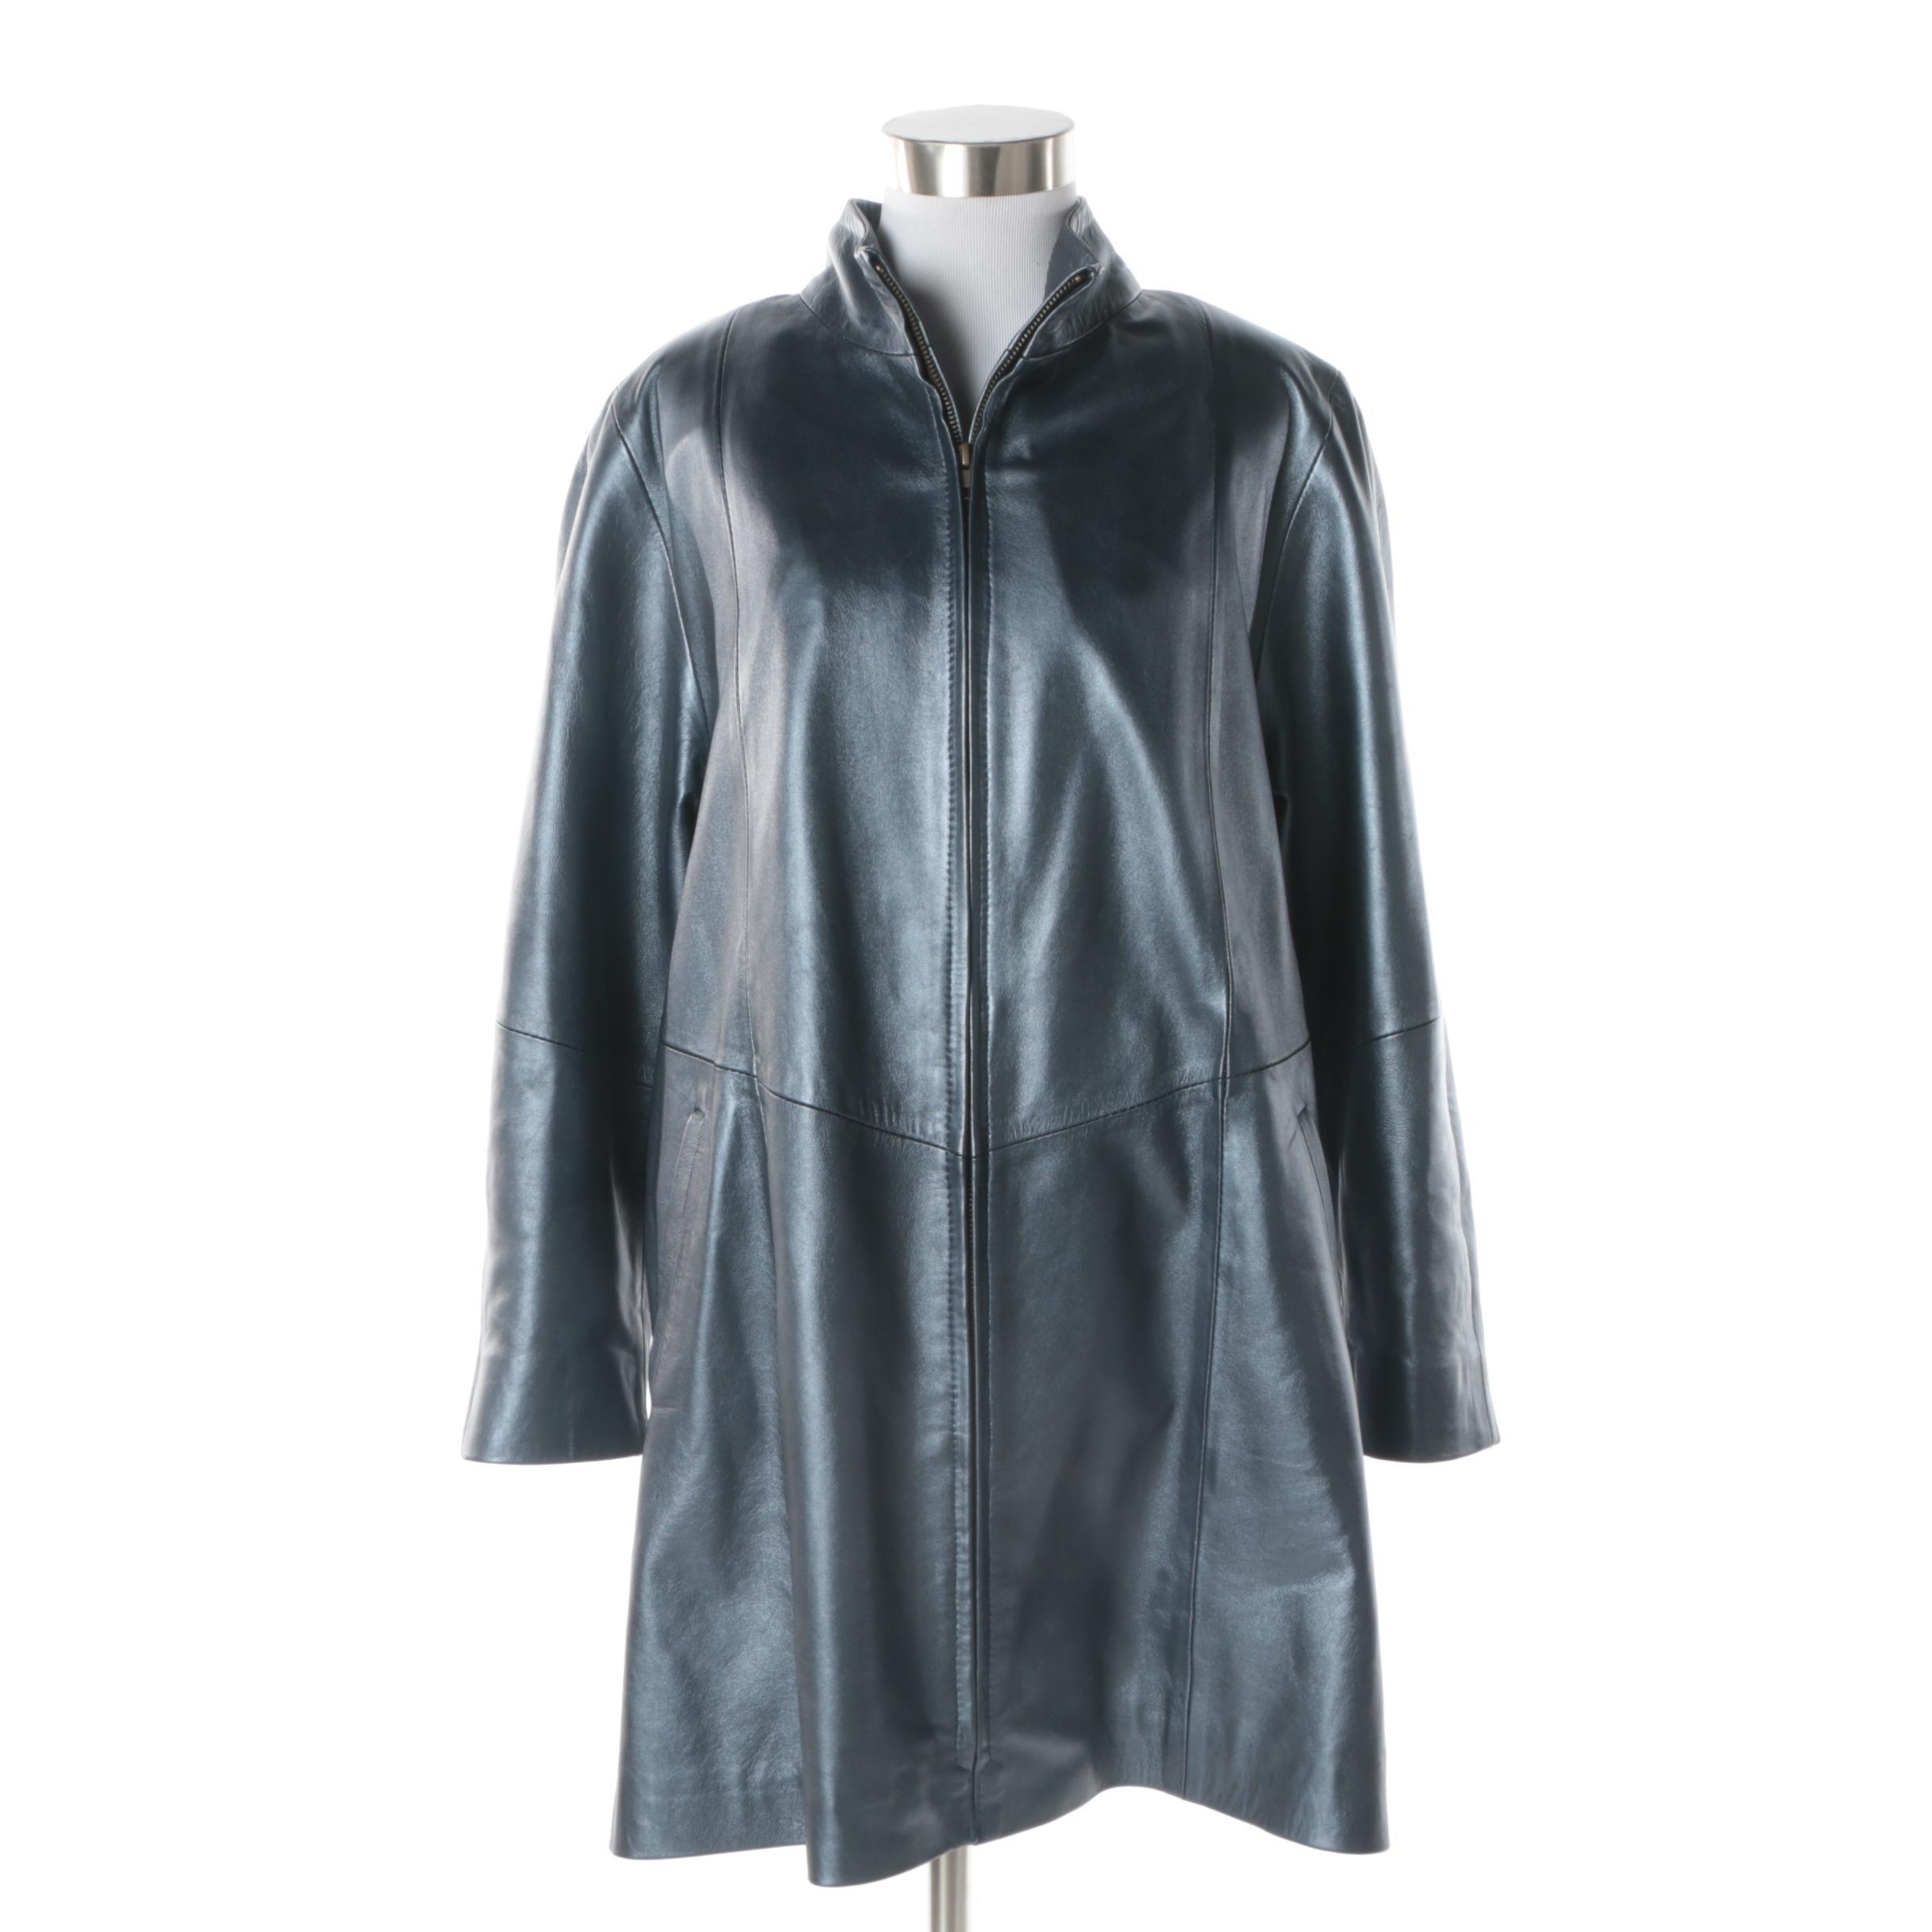 Women's Image Leather Metallic Blue Leather Jacket